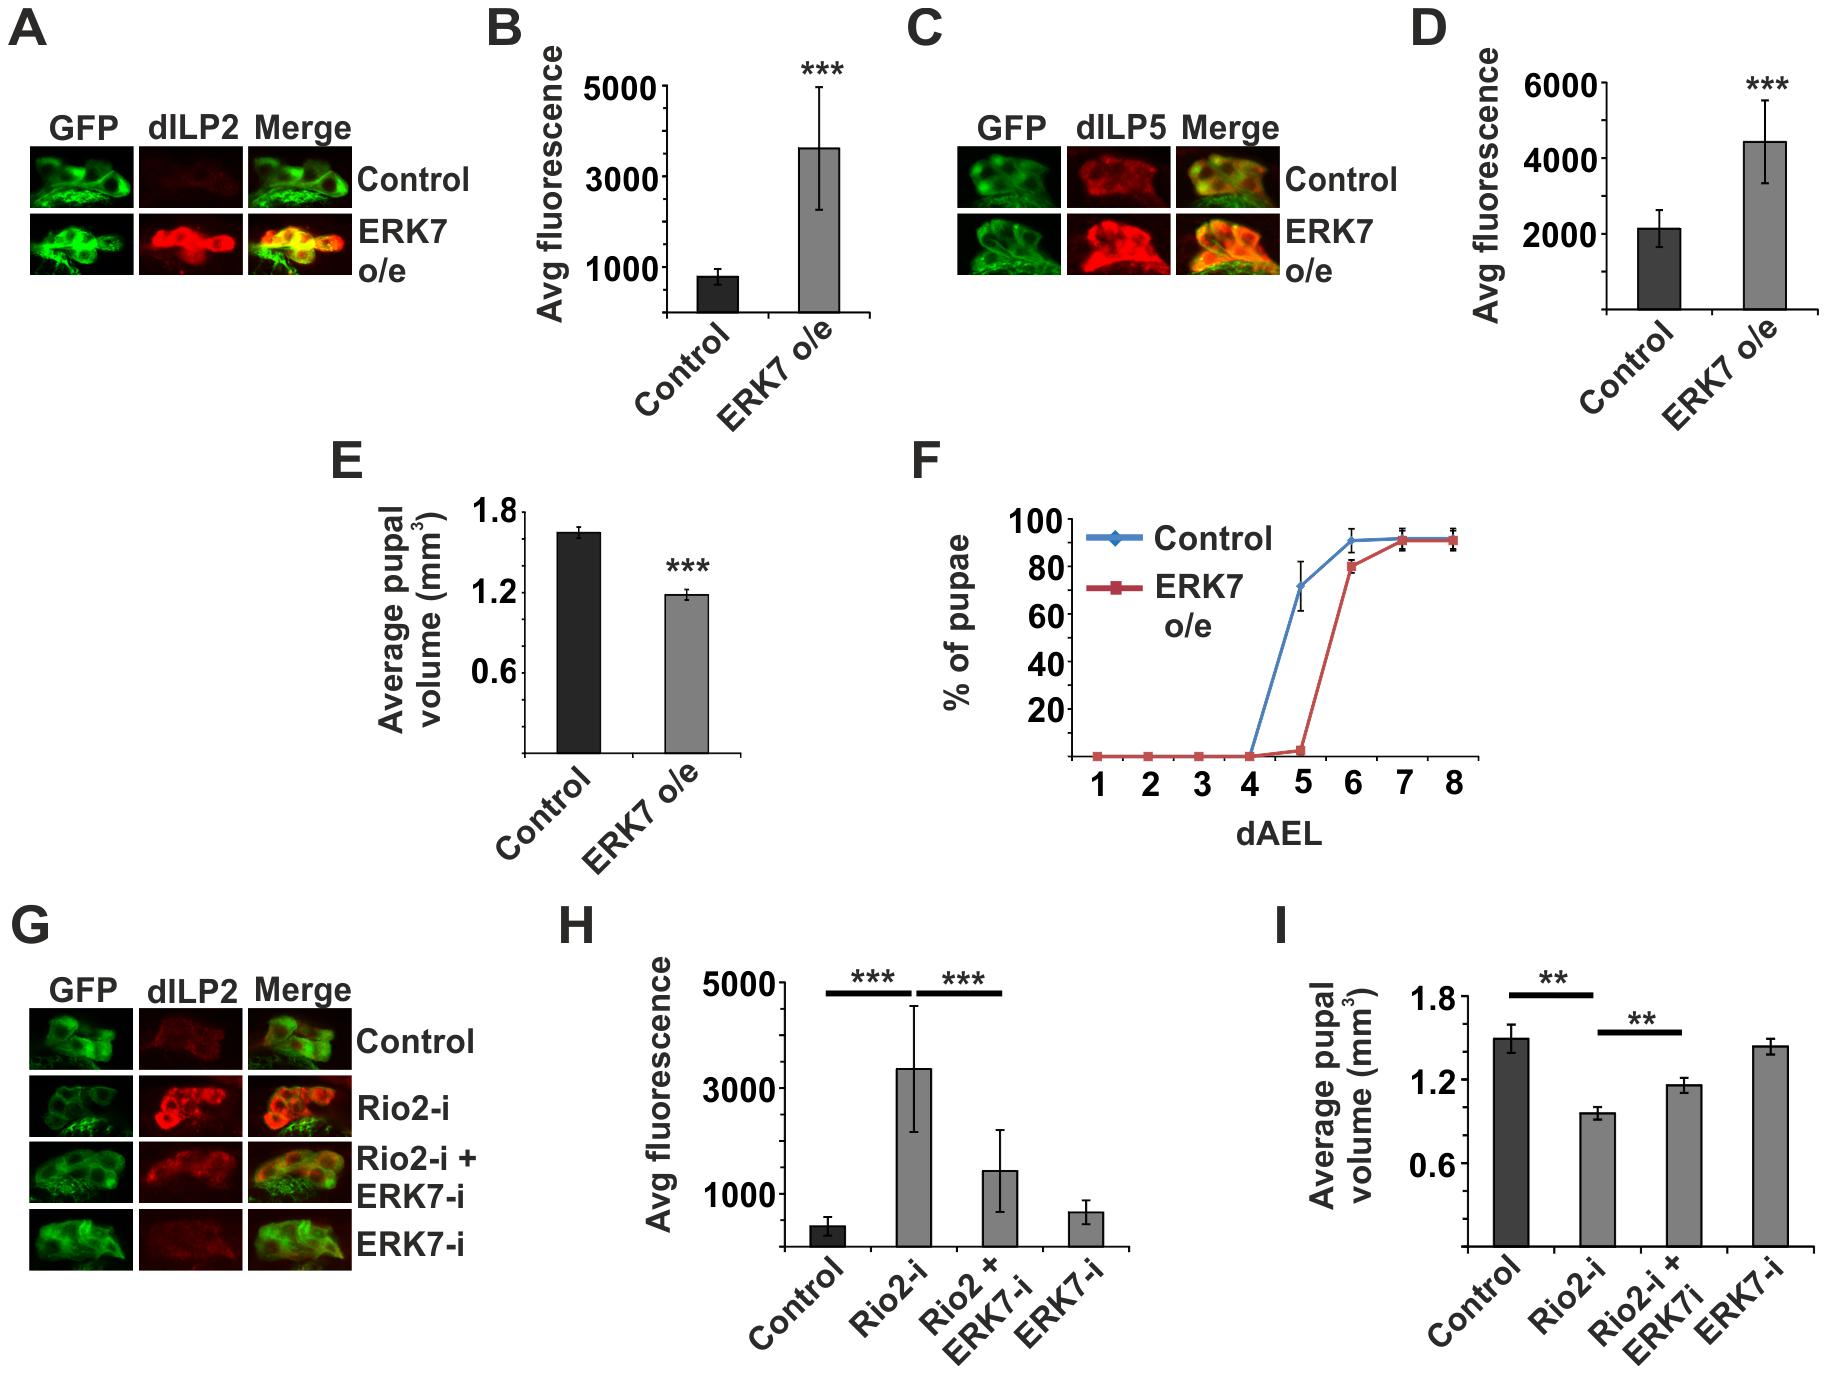 ERK7 mediates inhibition of dILP secretion upon disturbed ribosome biogenesis.